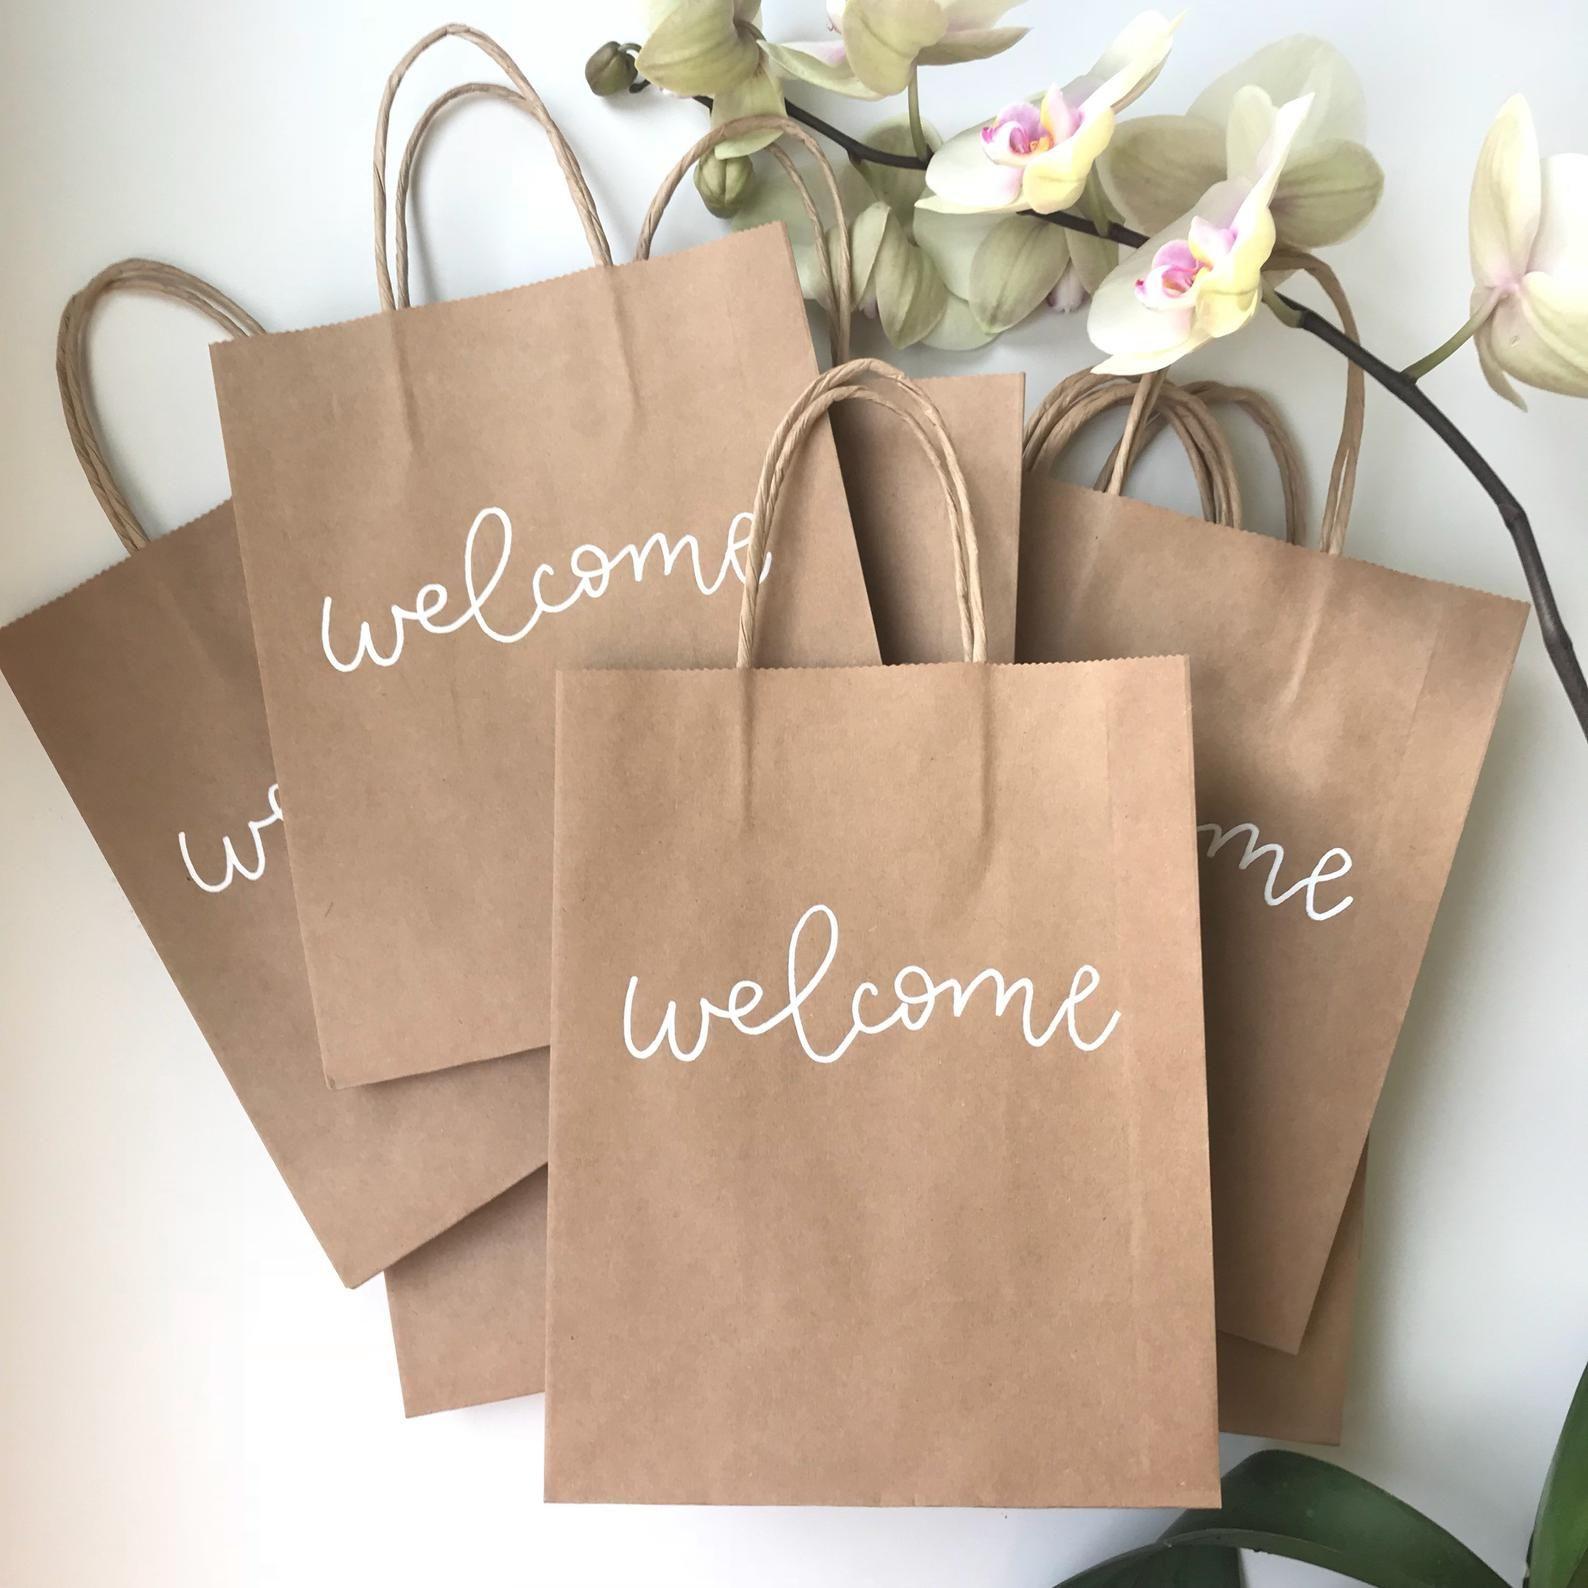 Destination Wedding Gift Ideas: Custom Gift Bags Wedding Favor Bags Destination Wedding